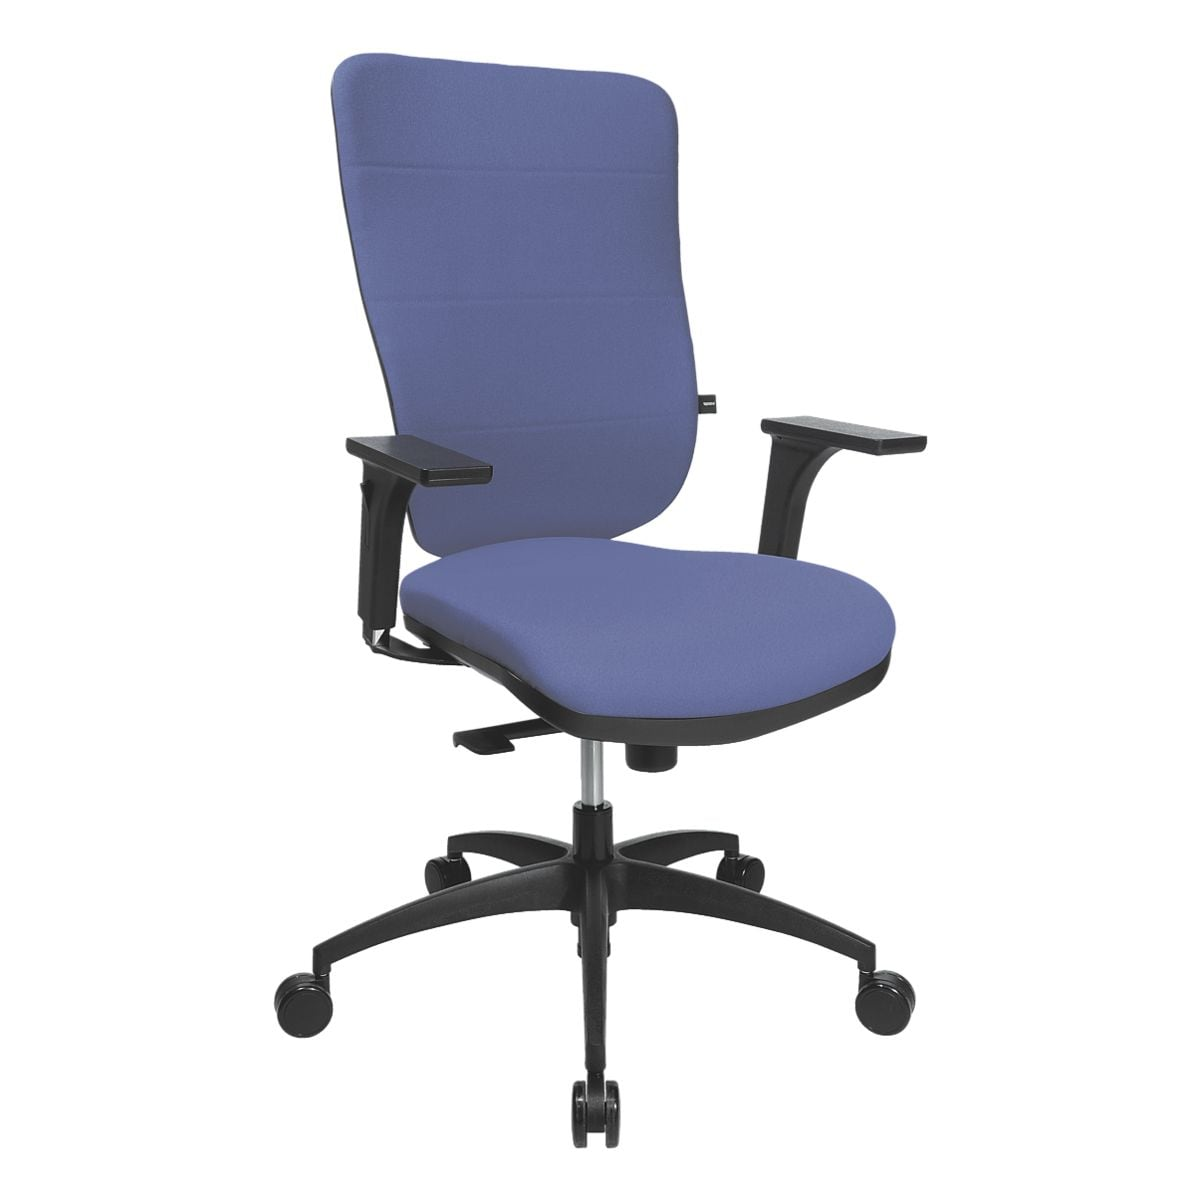 Bürostuhl Topstar »Soft Pro 100« ohne Armlehnen, Fußkreuz schwarz